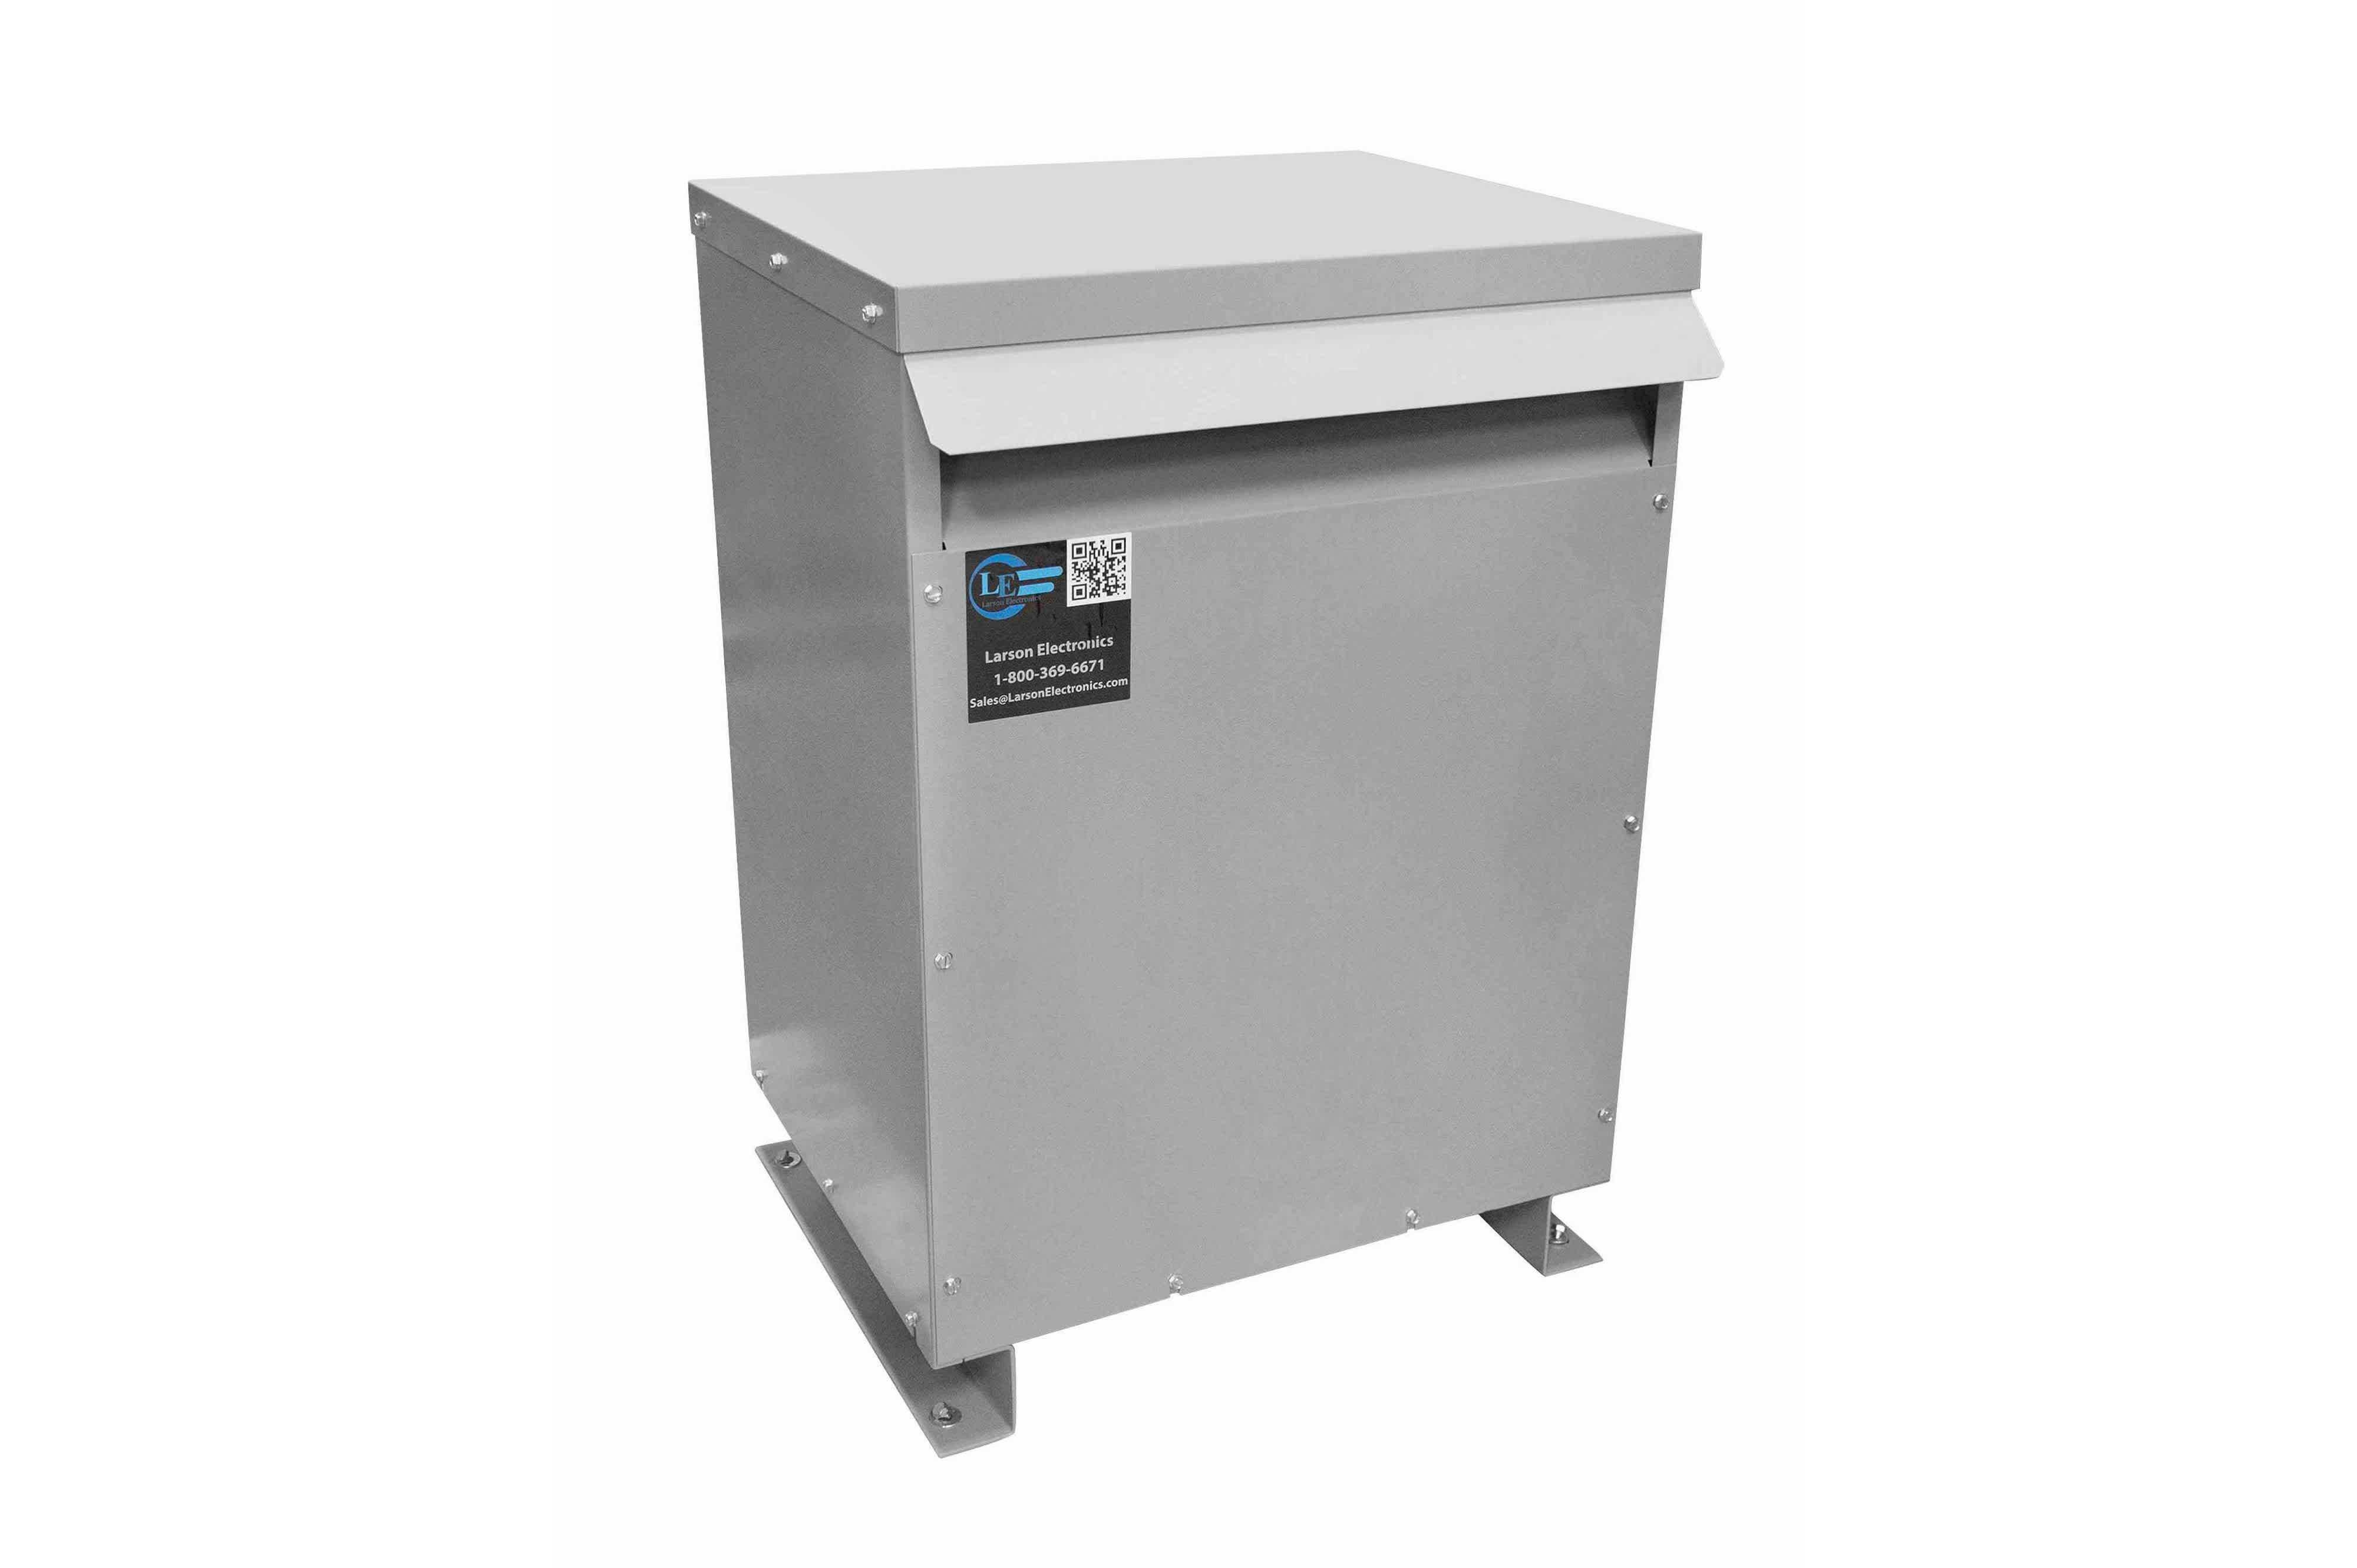 125 kVA 3PH Isolation Transformer, 600V Wye Primary, 240V/120 Delta Secondary, N3R, Ventilated, 60 Hz